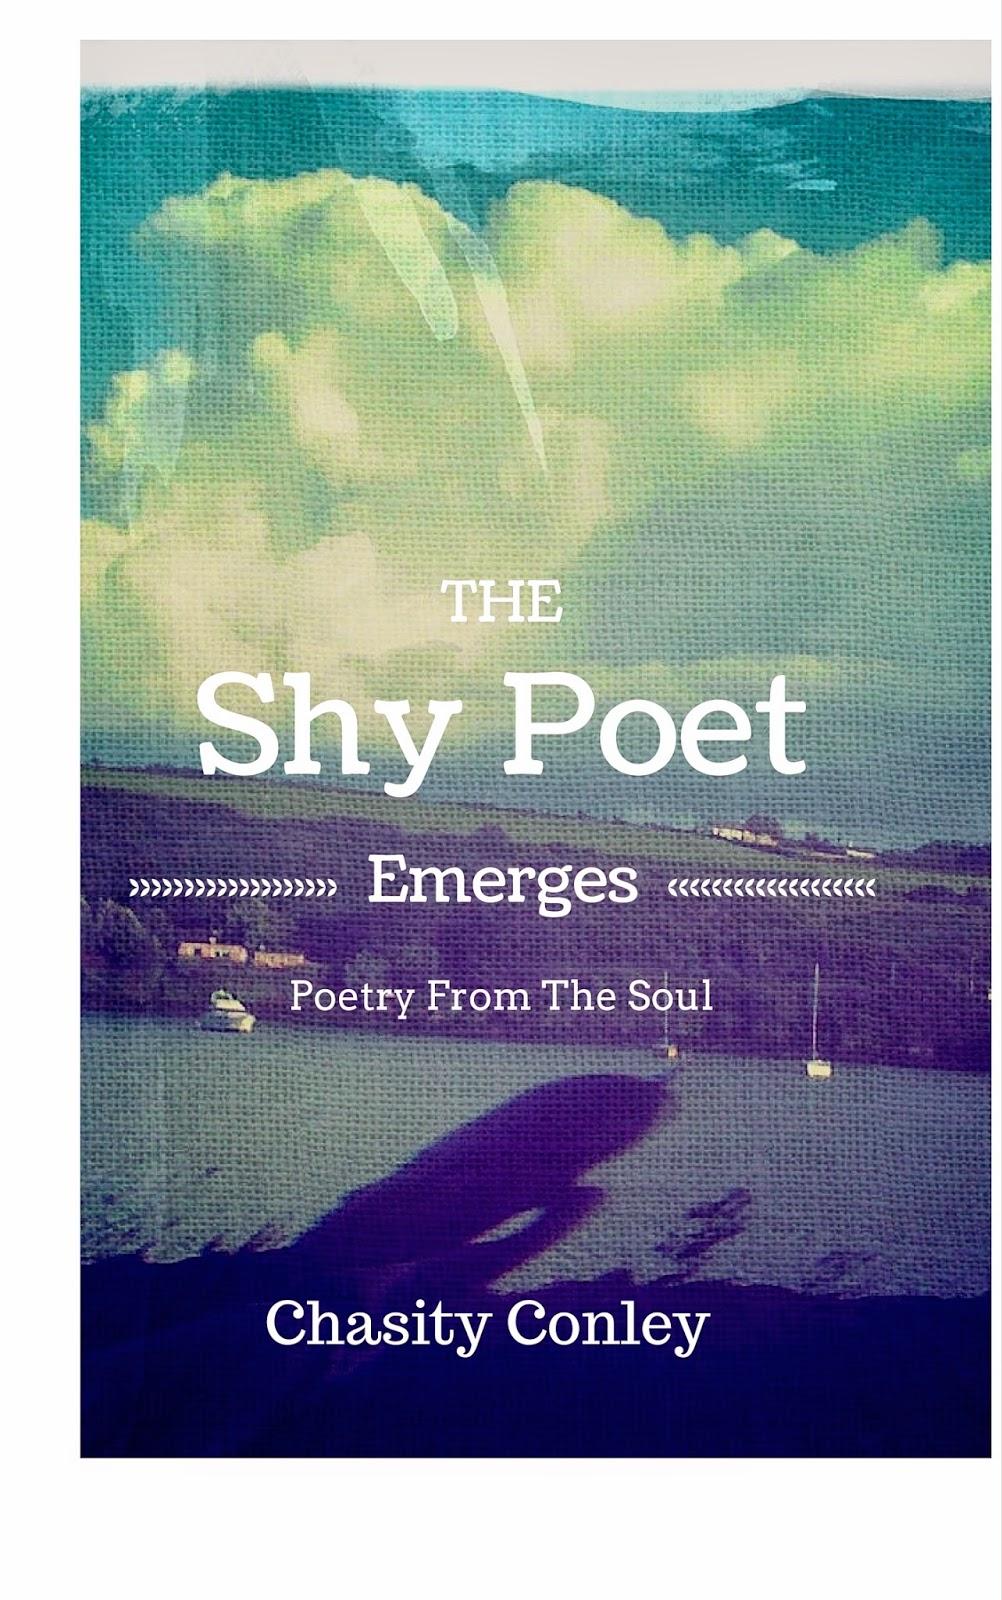 http://www.amazon.com/Shy-Poet-Emerges-Chasity-Conley-ebook/dp/B00SER1640/ref=sr_1_1?s=digital-text&ie=UTF8&qid=1422240700&sr=1-1&keywords=the+shy+poet+emerges#_